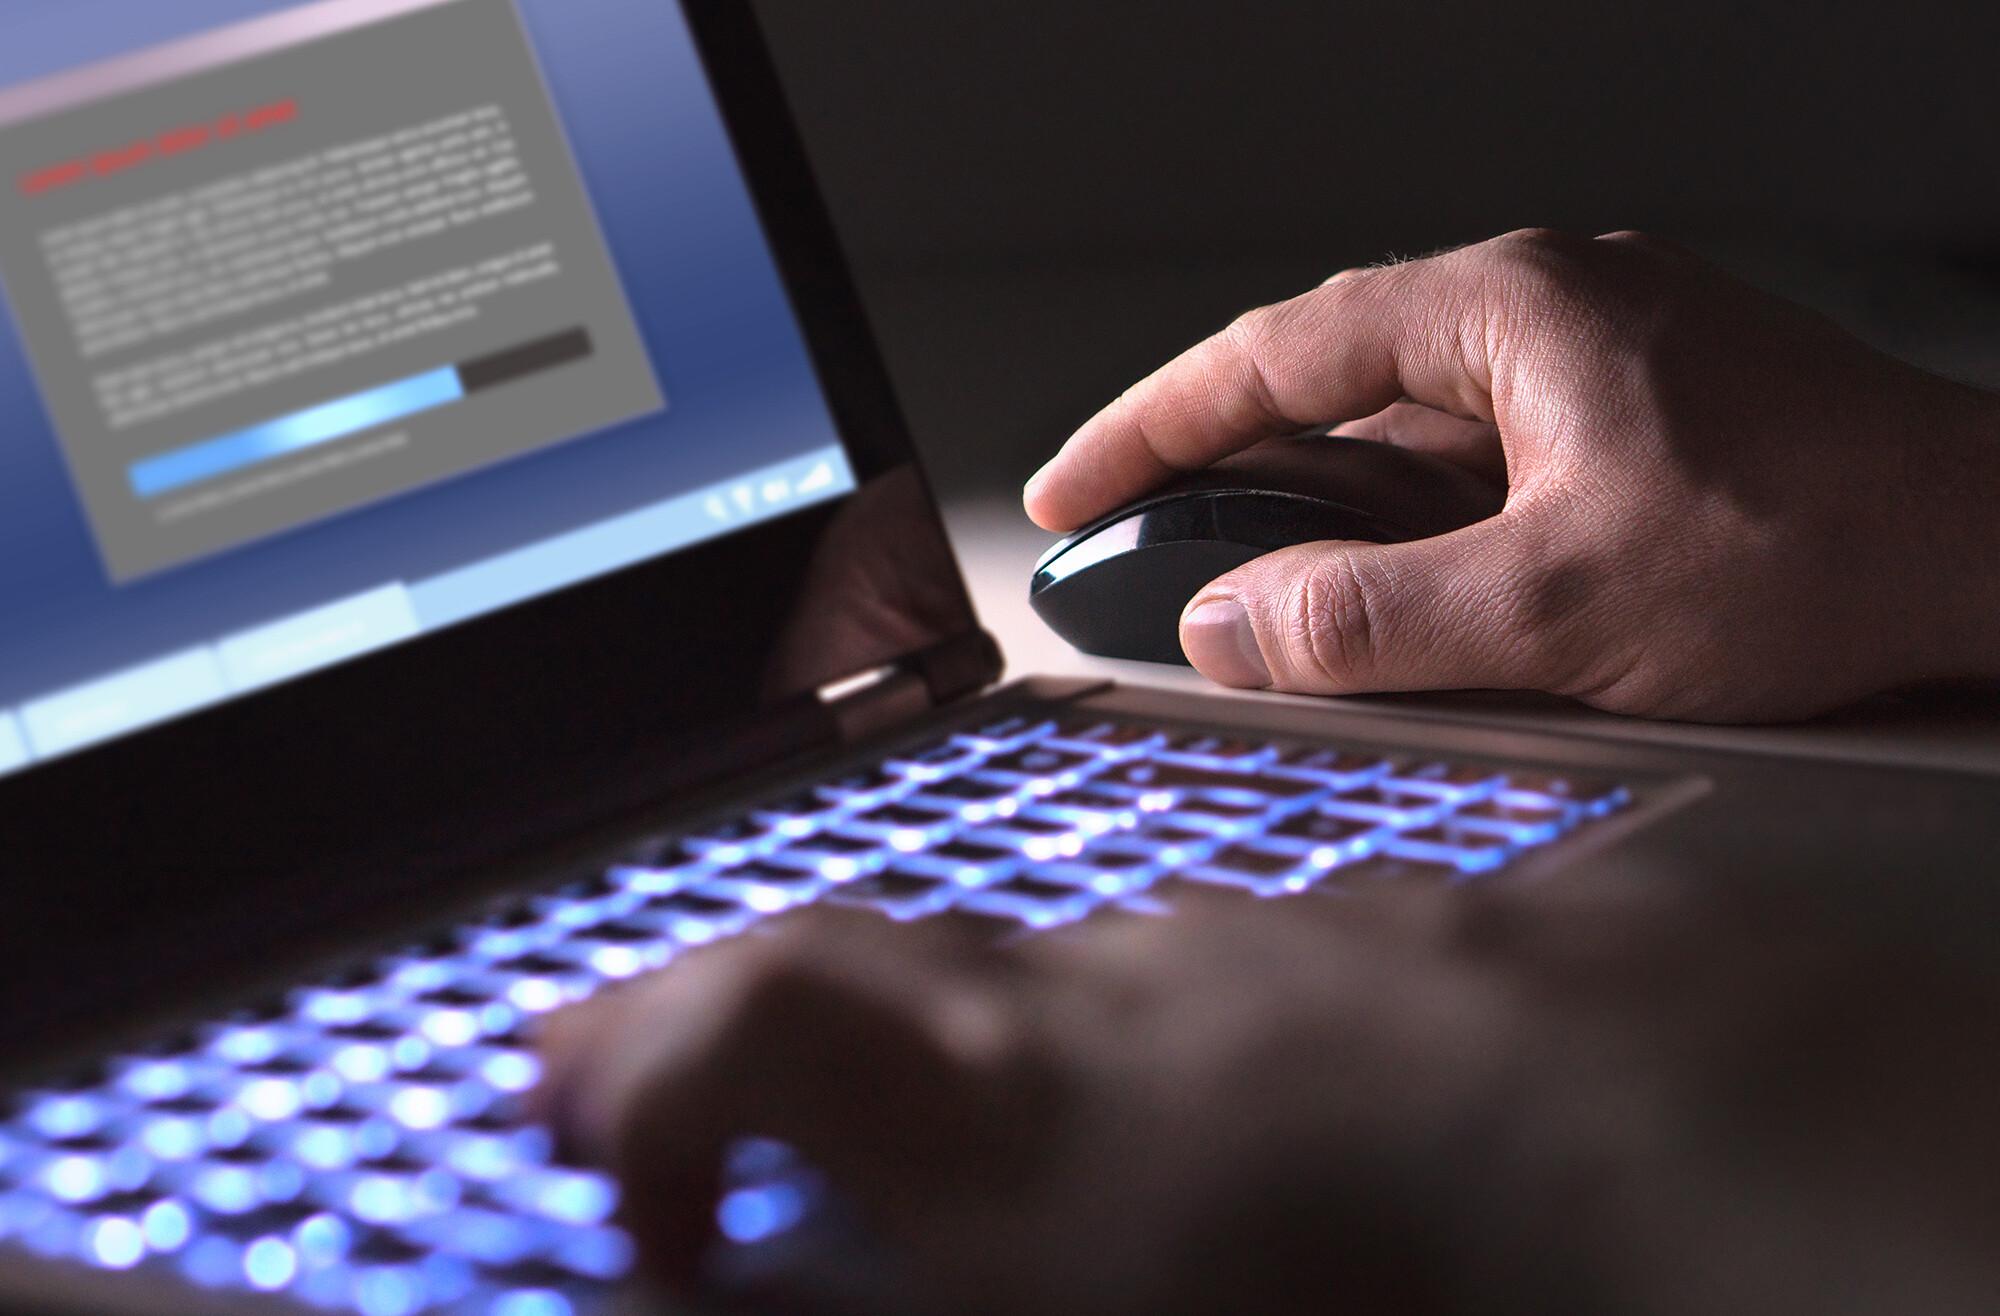 Two 'prolific' ransomware operators arrested in Ukraine, Europol announces